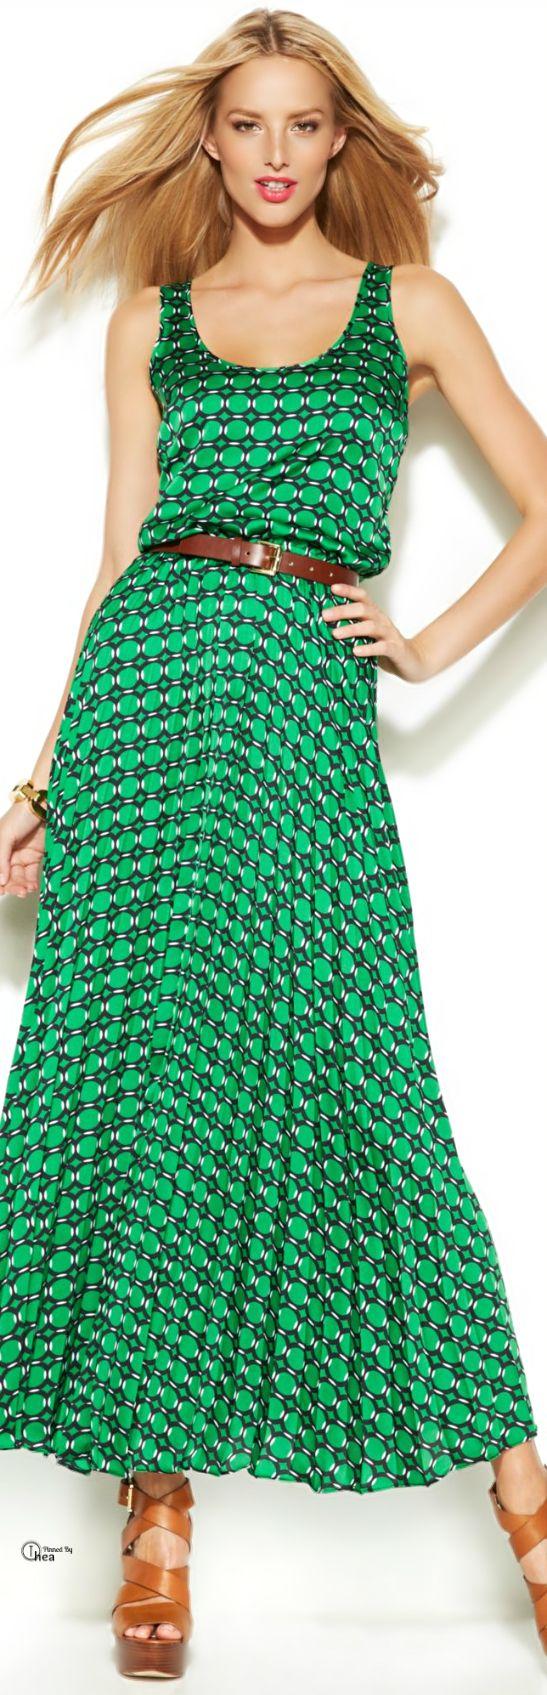 Michael Kors ● Green Printed Maxi Dress